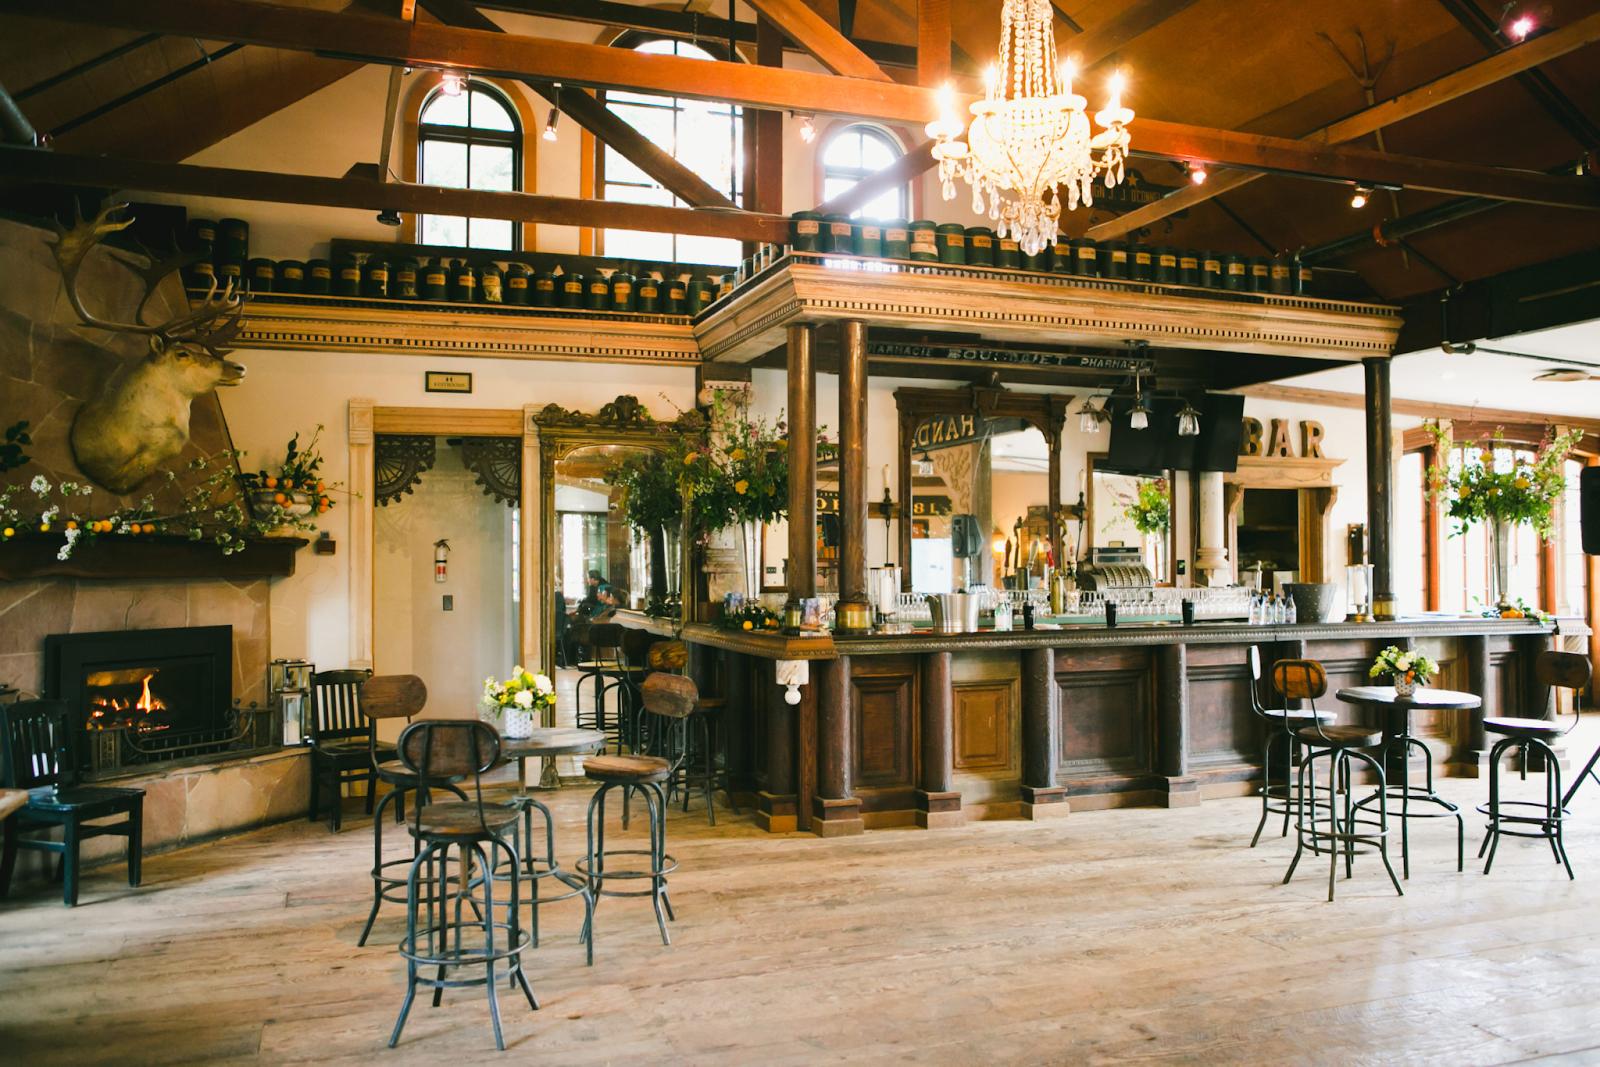 Triple S Ranch bar area